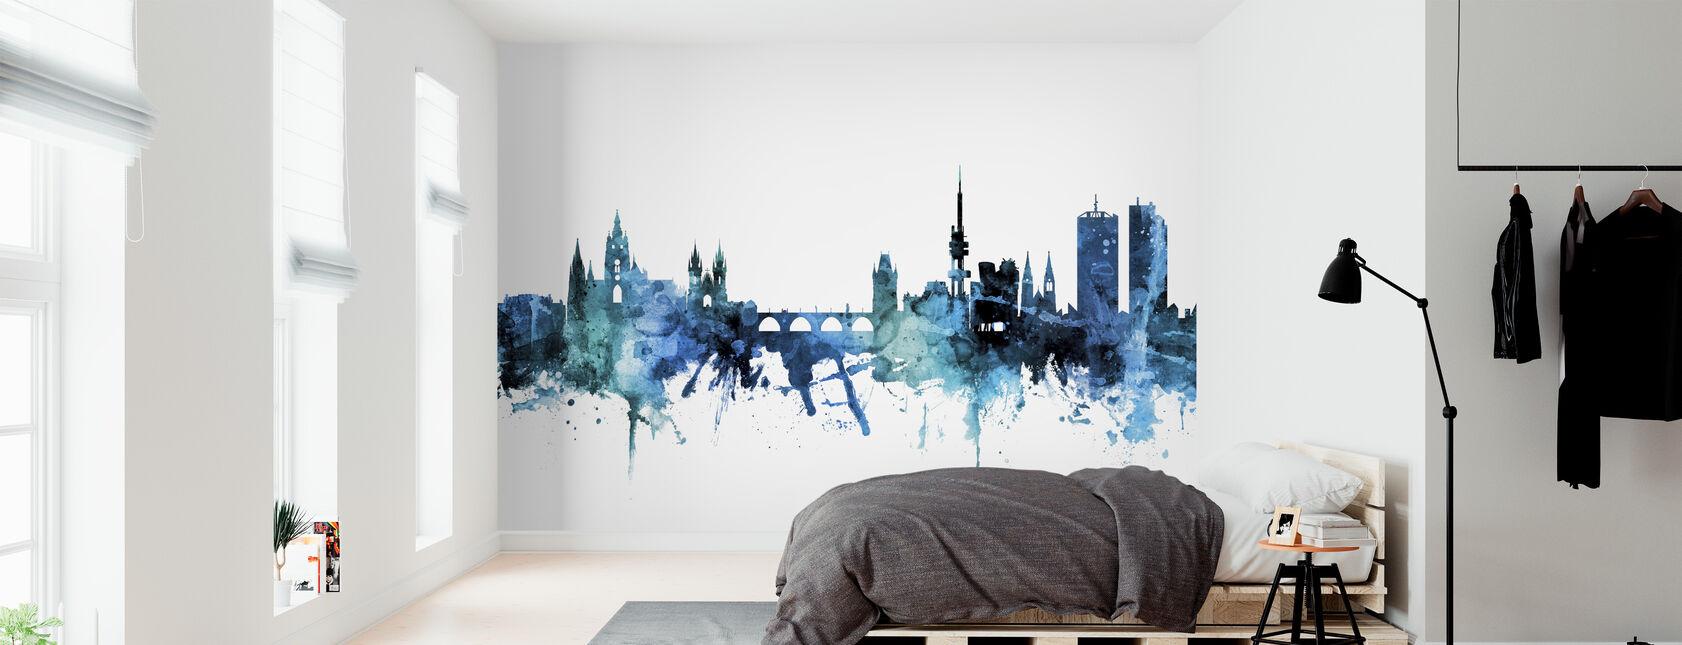 Prag (Praha) Den Tjekkiske Republik Skyline - Tapet - Soveværelse